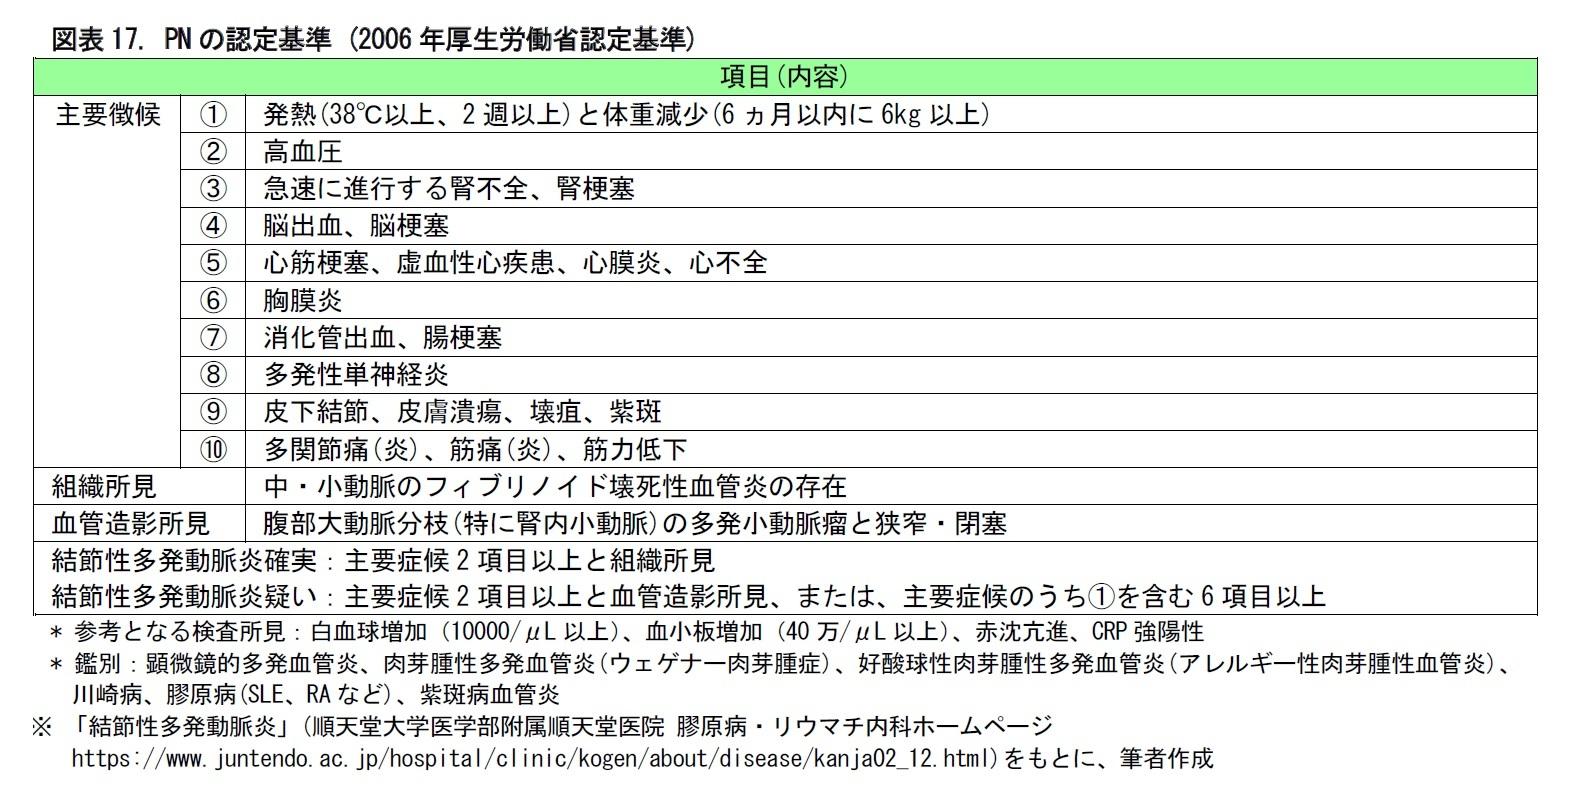 図表17. PNの認定基準 (2006年厚生労働省認定基準)